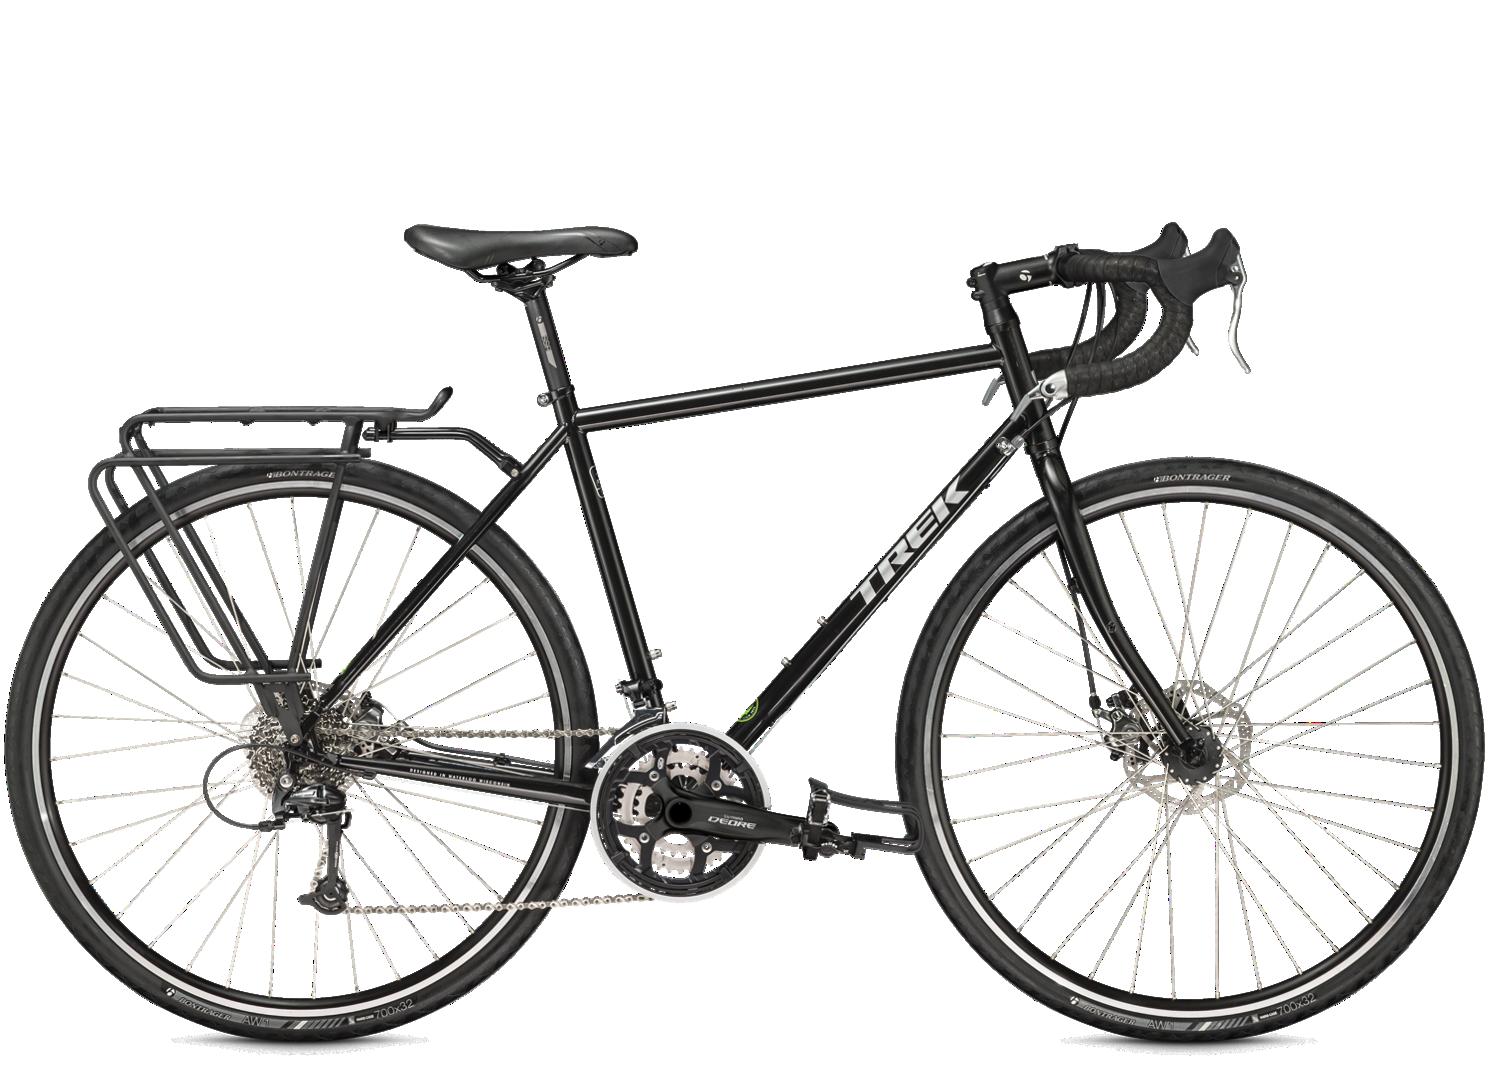 2016 520 Disc - Bike Archive - Trek Bicycle